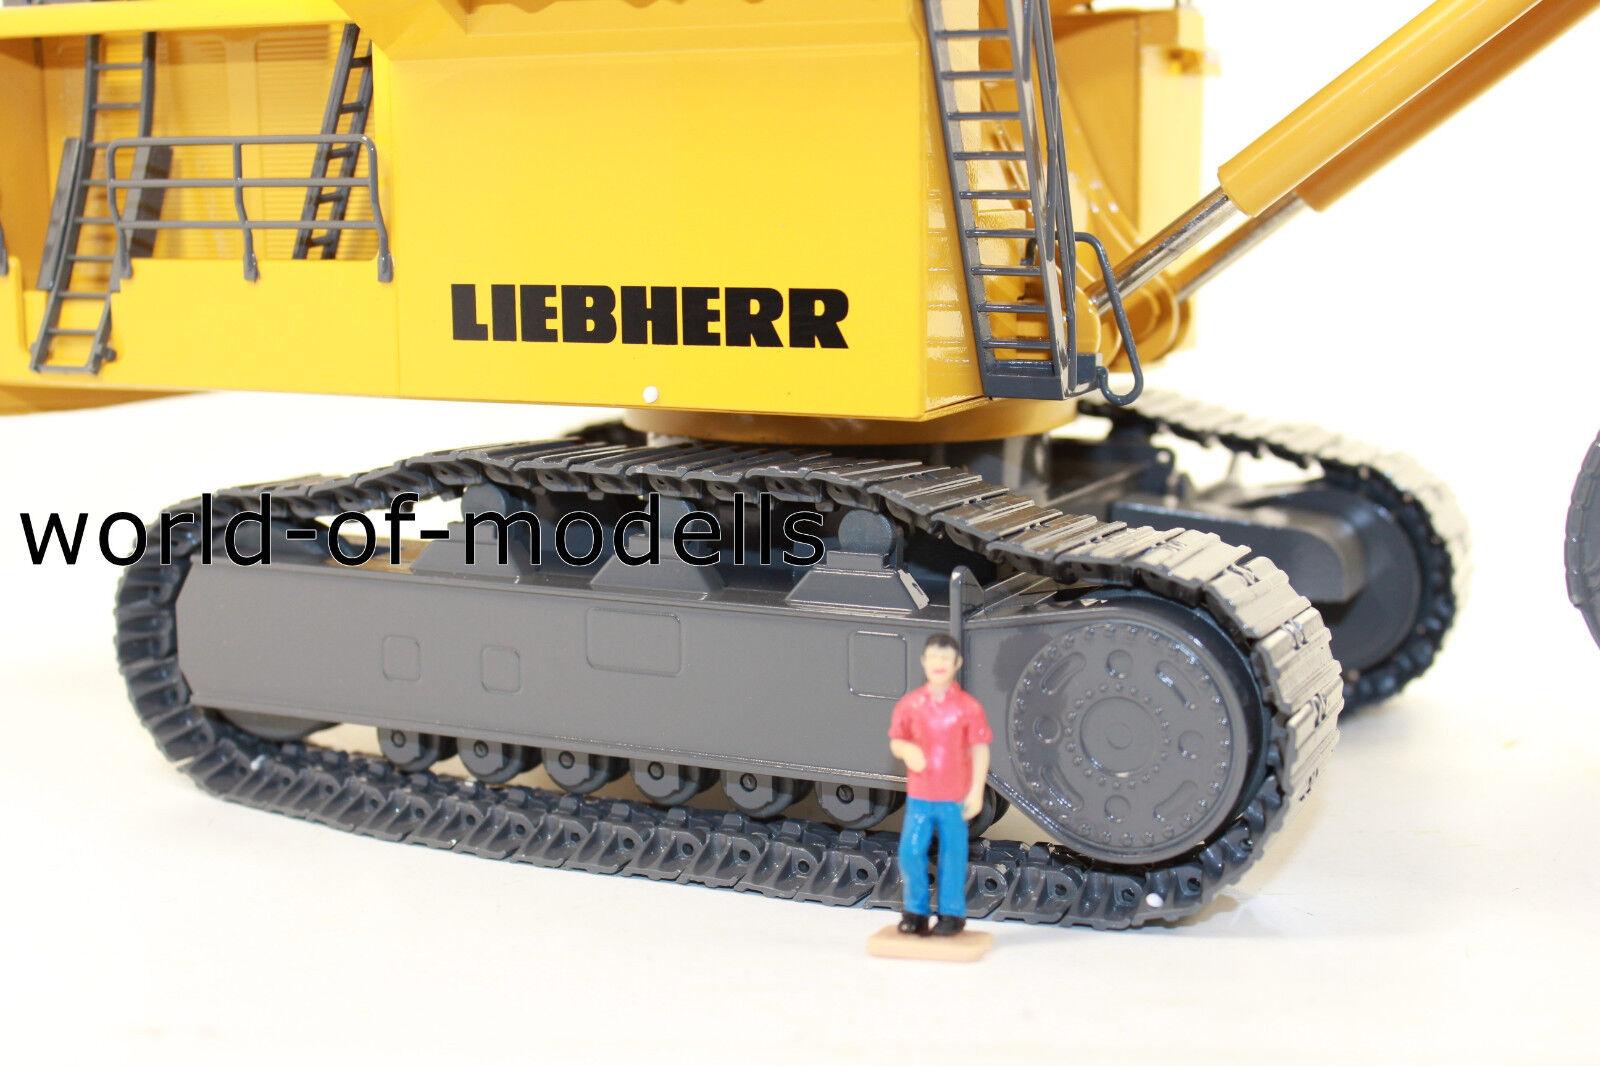 YY Conrad 2916 01 Liebherr R 996 grandi escavatori idraulici amarillo TL 1 50 NUOVO in OVP YY